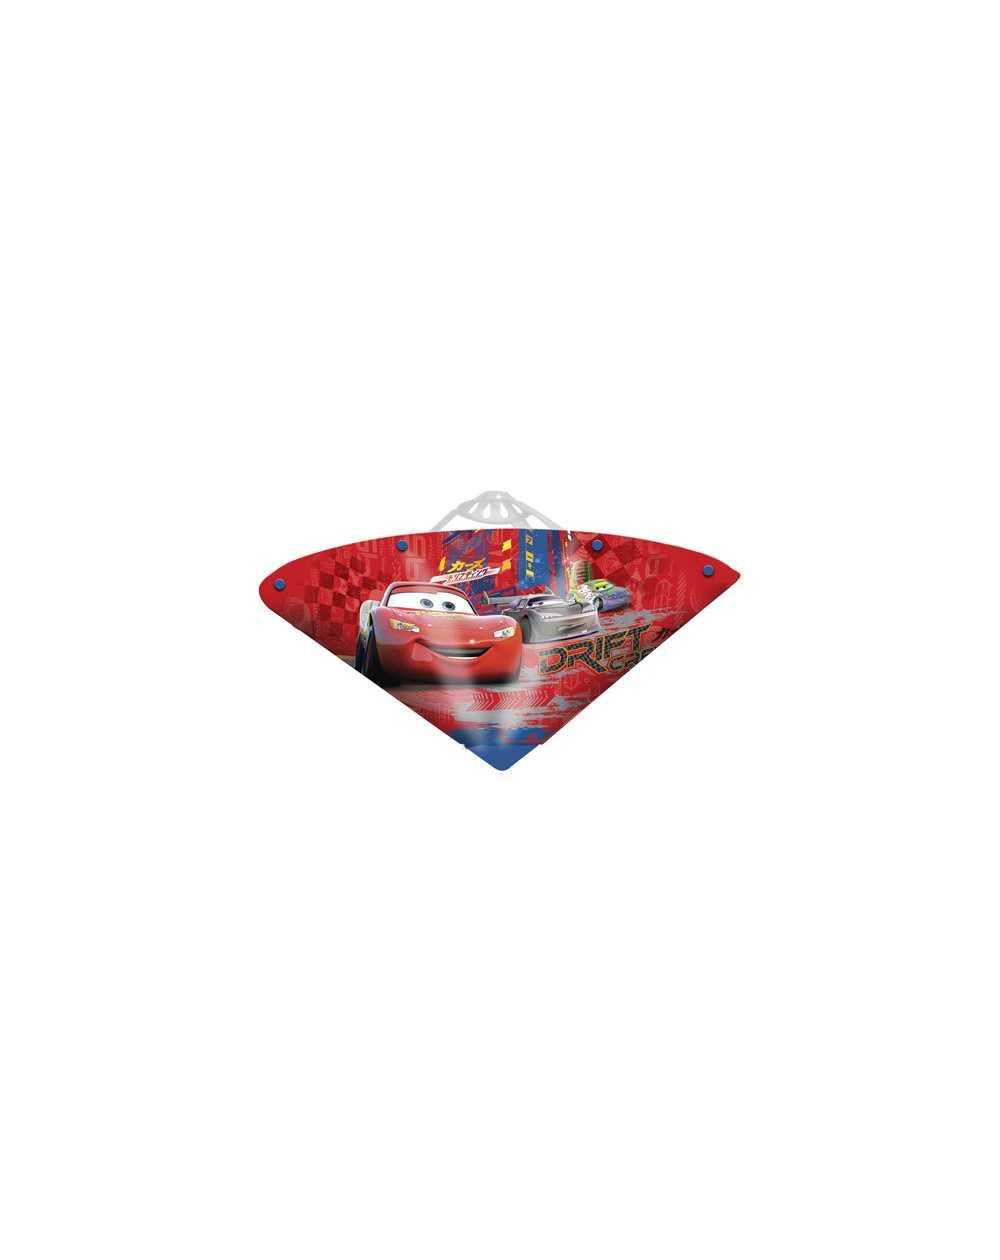 lampadario topolino : Lampadario A Sospensione Saetta Cars Lampada Disney - Rasoline L.F.D ...